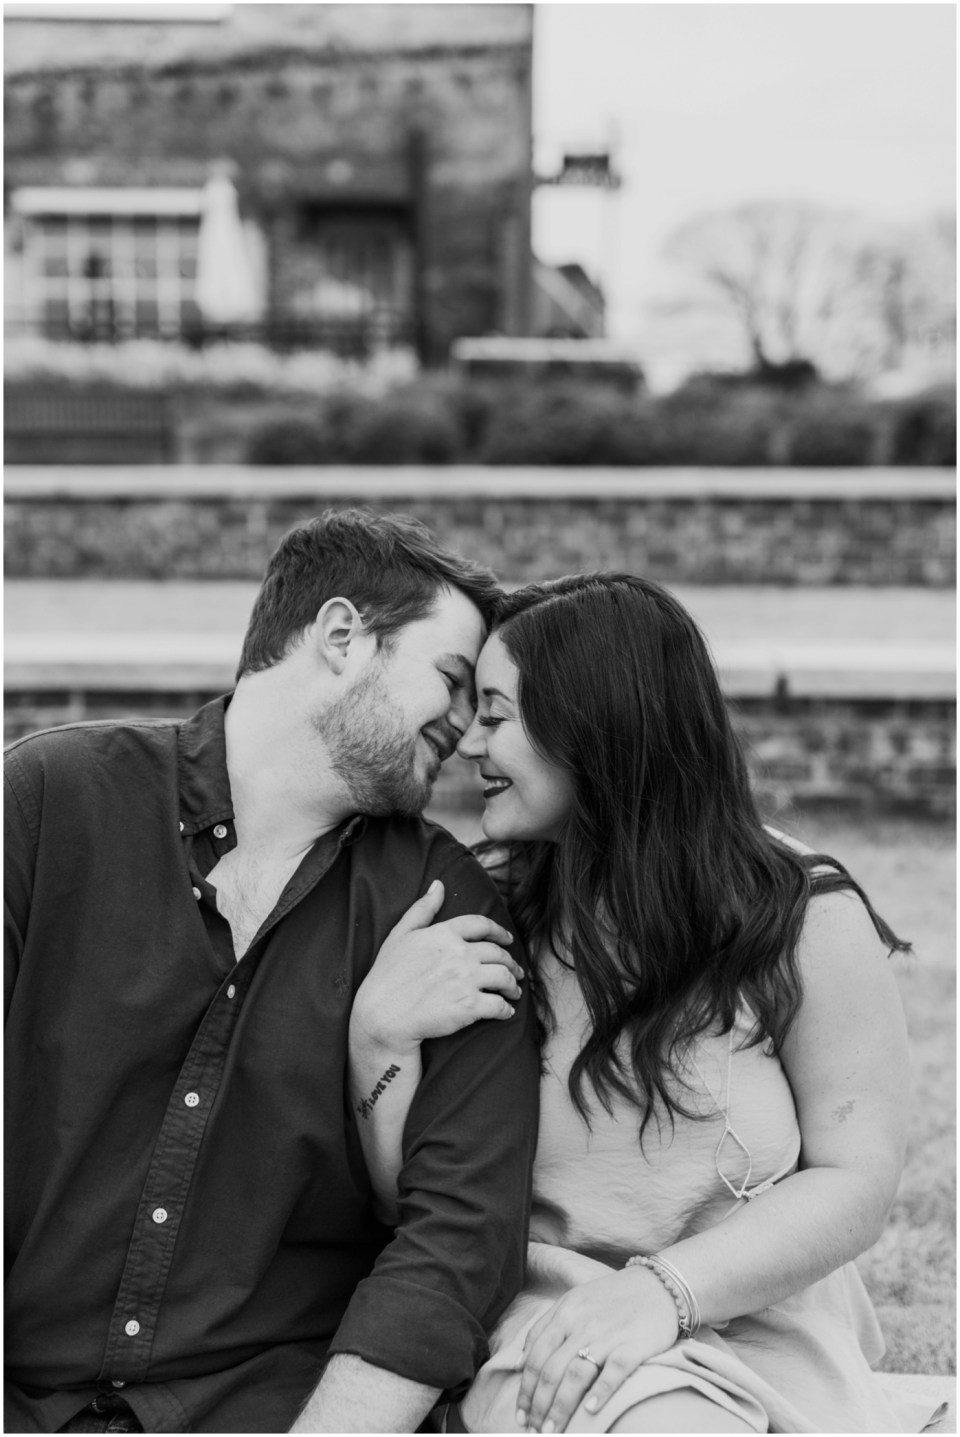 Braselton Engagement Photography